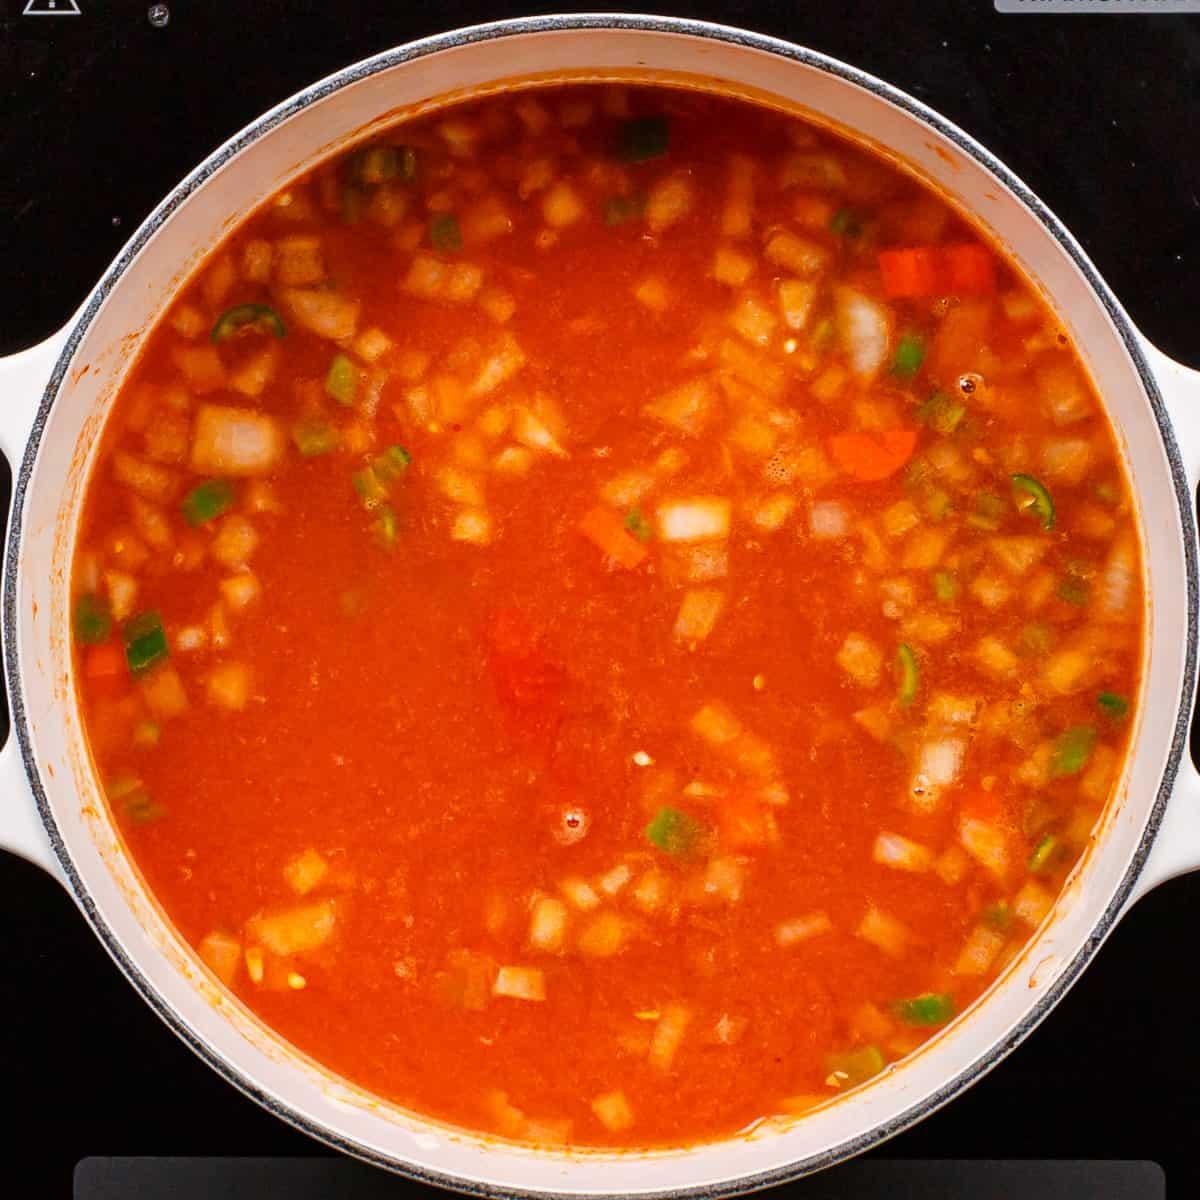 tomato based broth